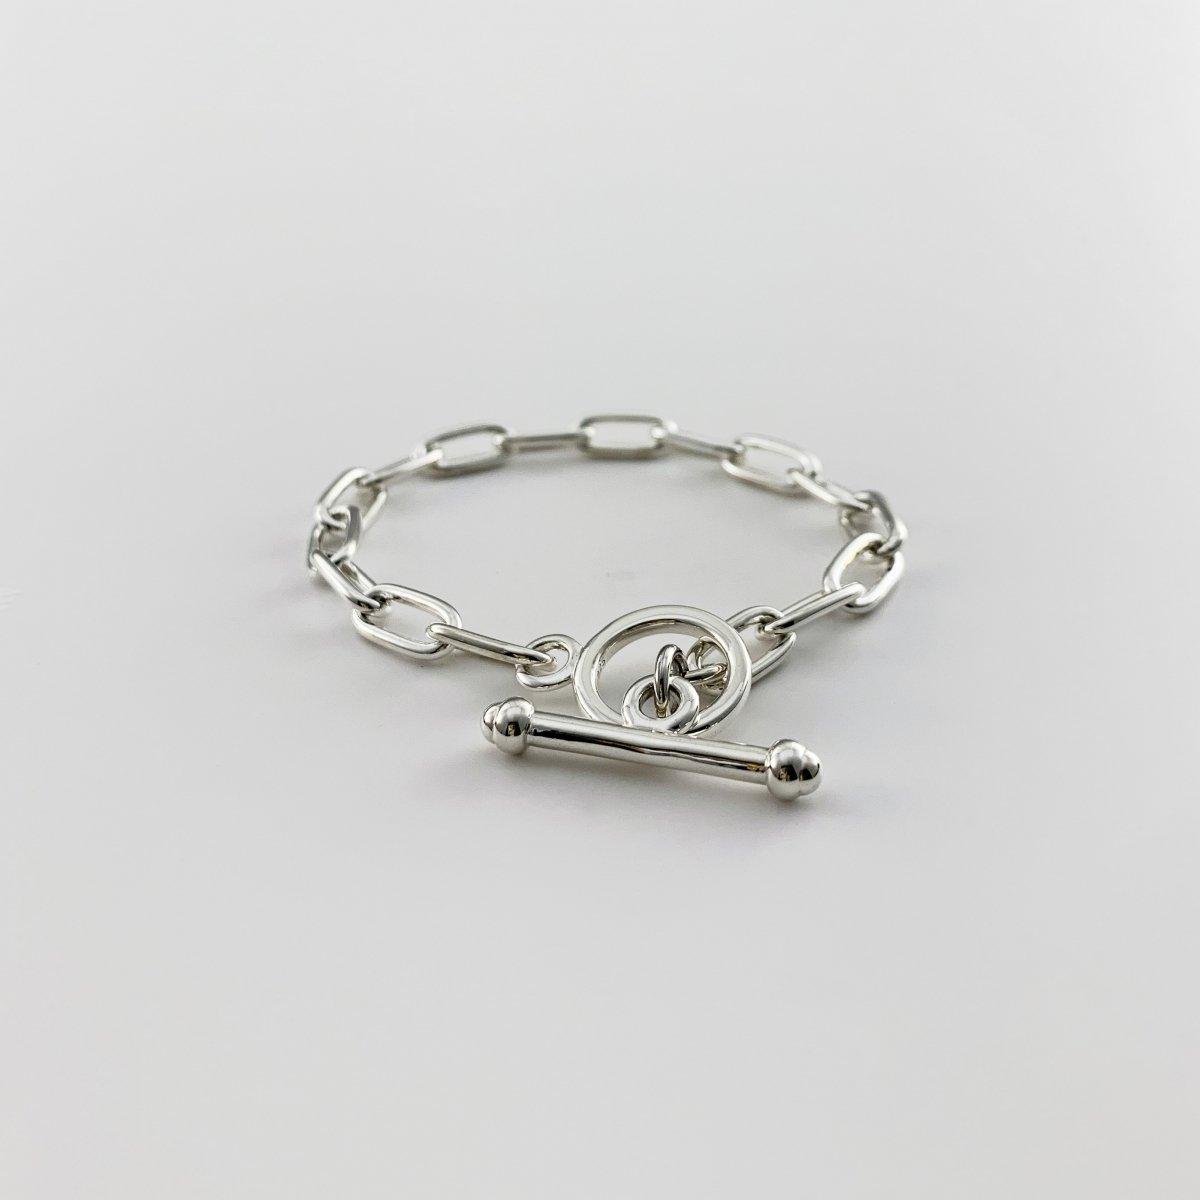 b chain bracelet S